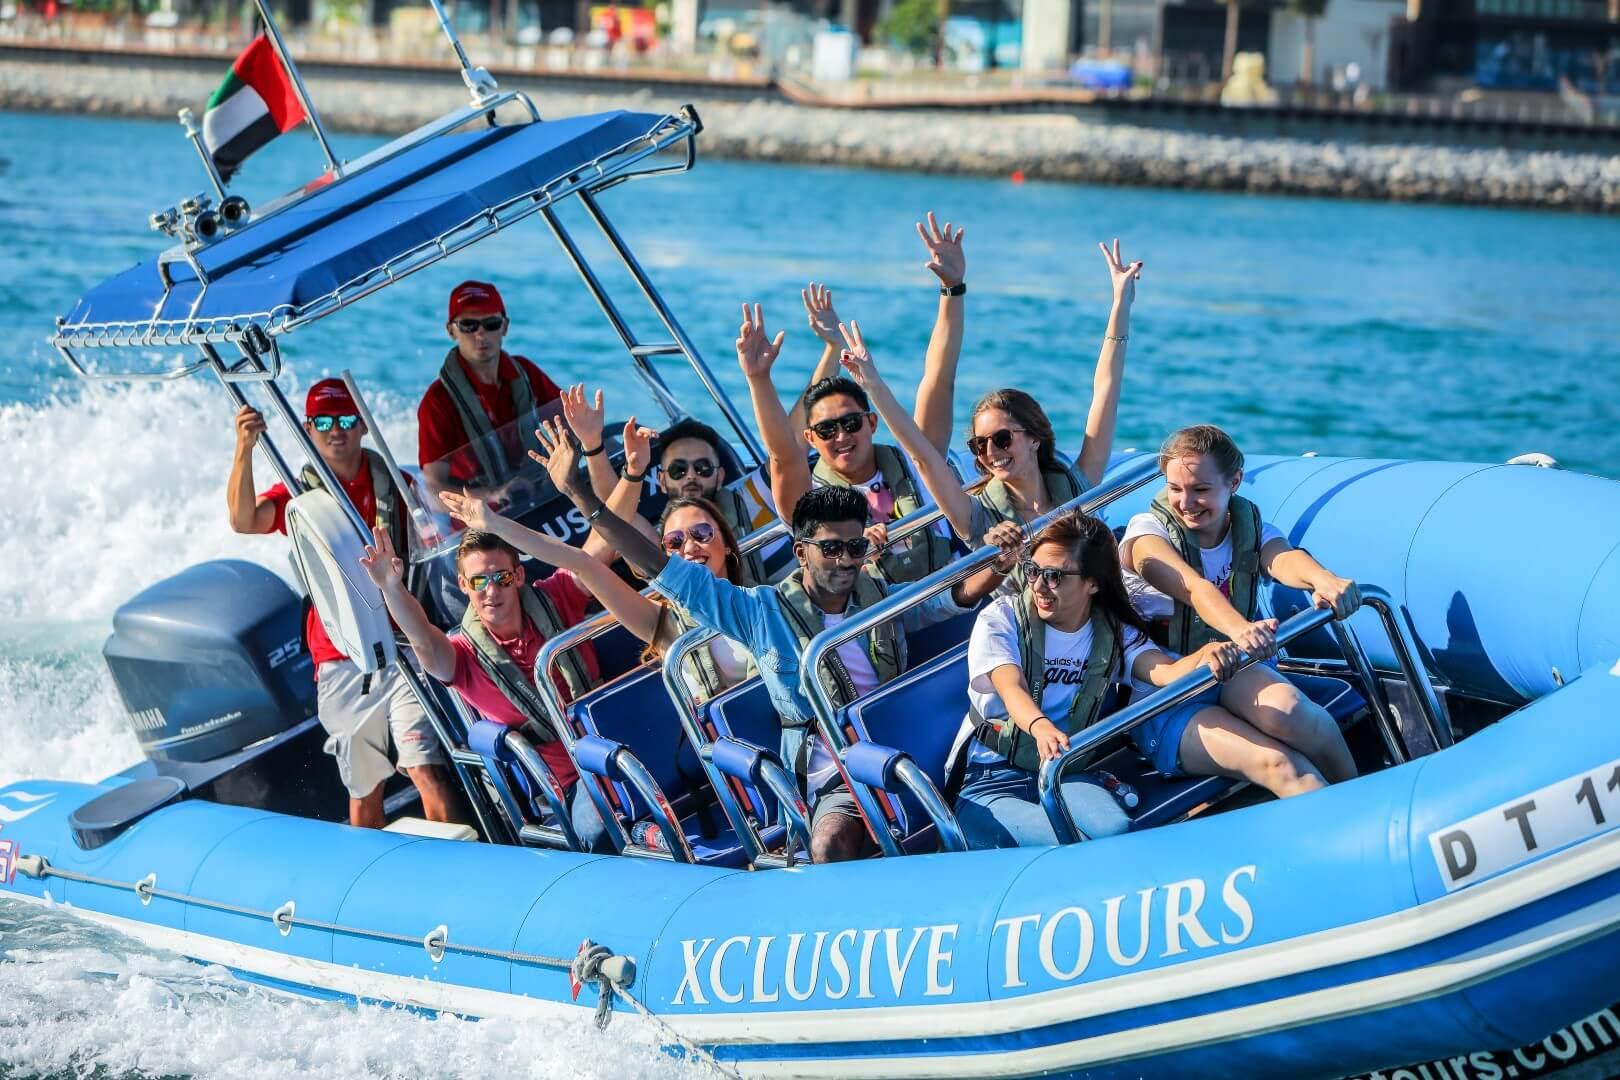 Xclusive Yachts - Speed Boat Tour: Marina, Atlantis, Palm, Burj Al Arab